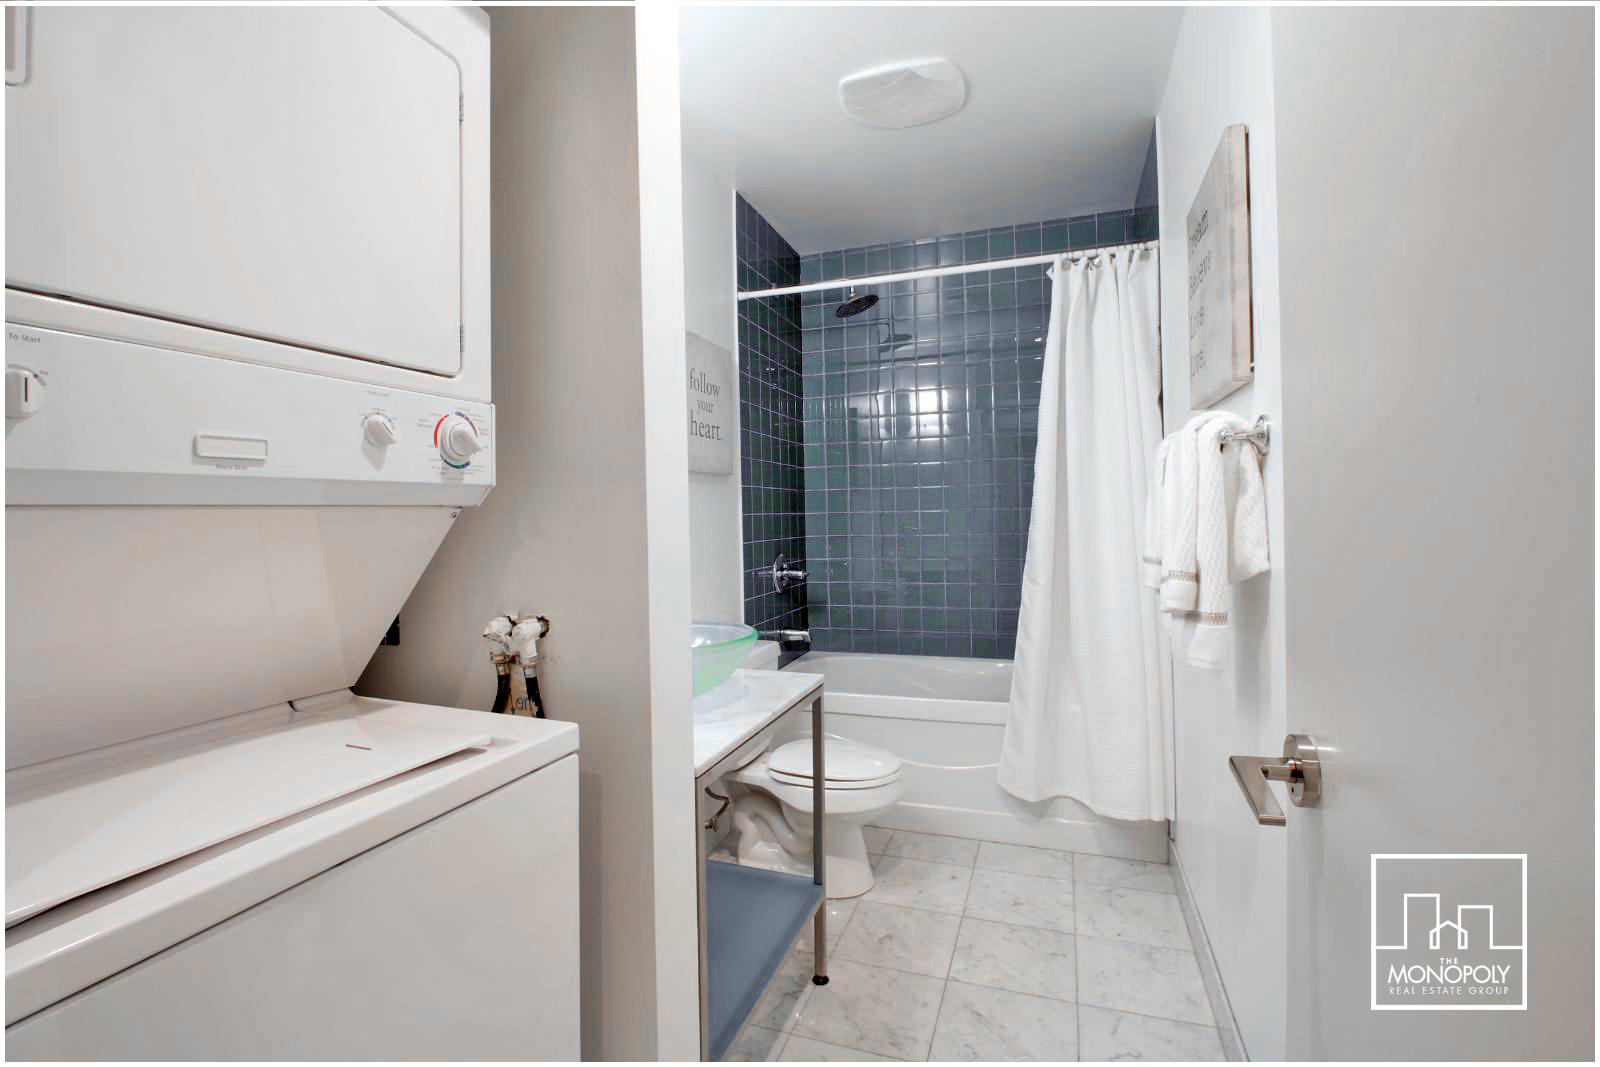 06 - Bathroom.jpg